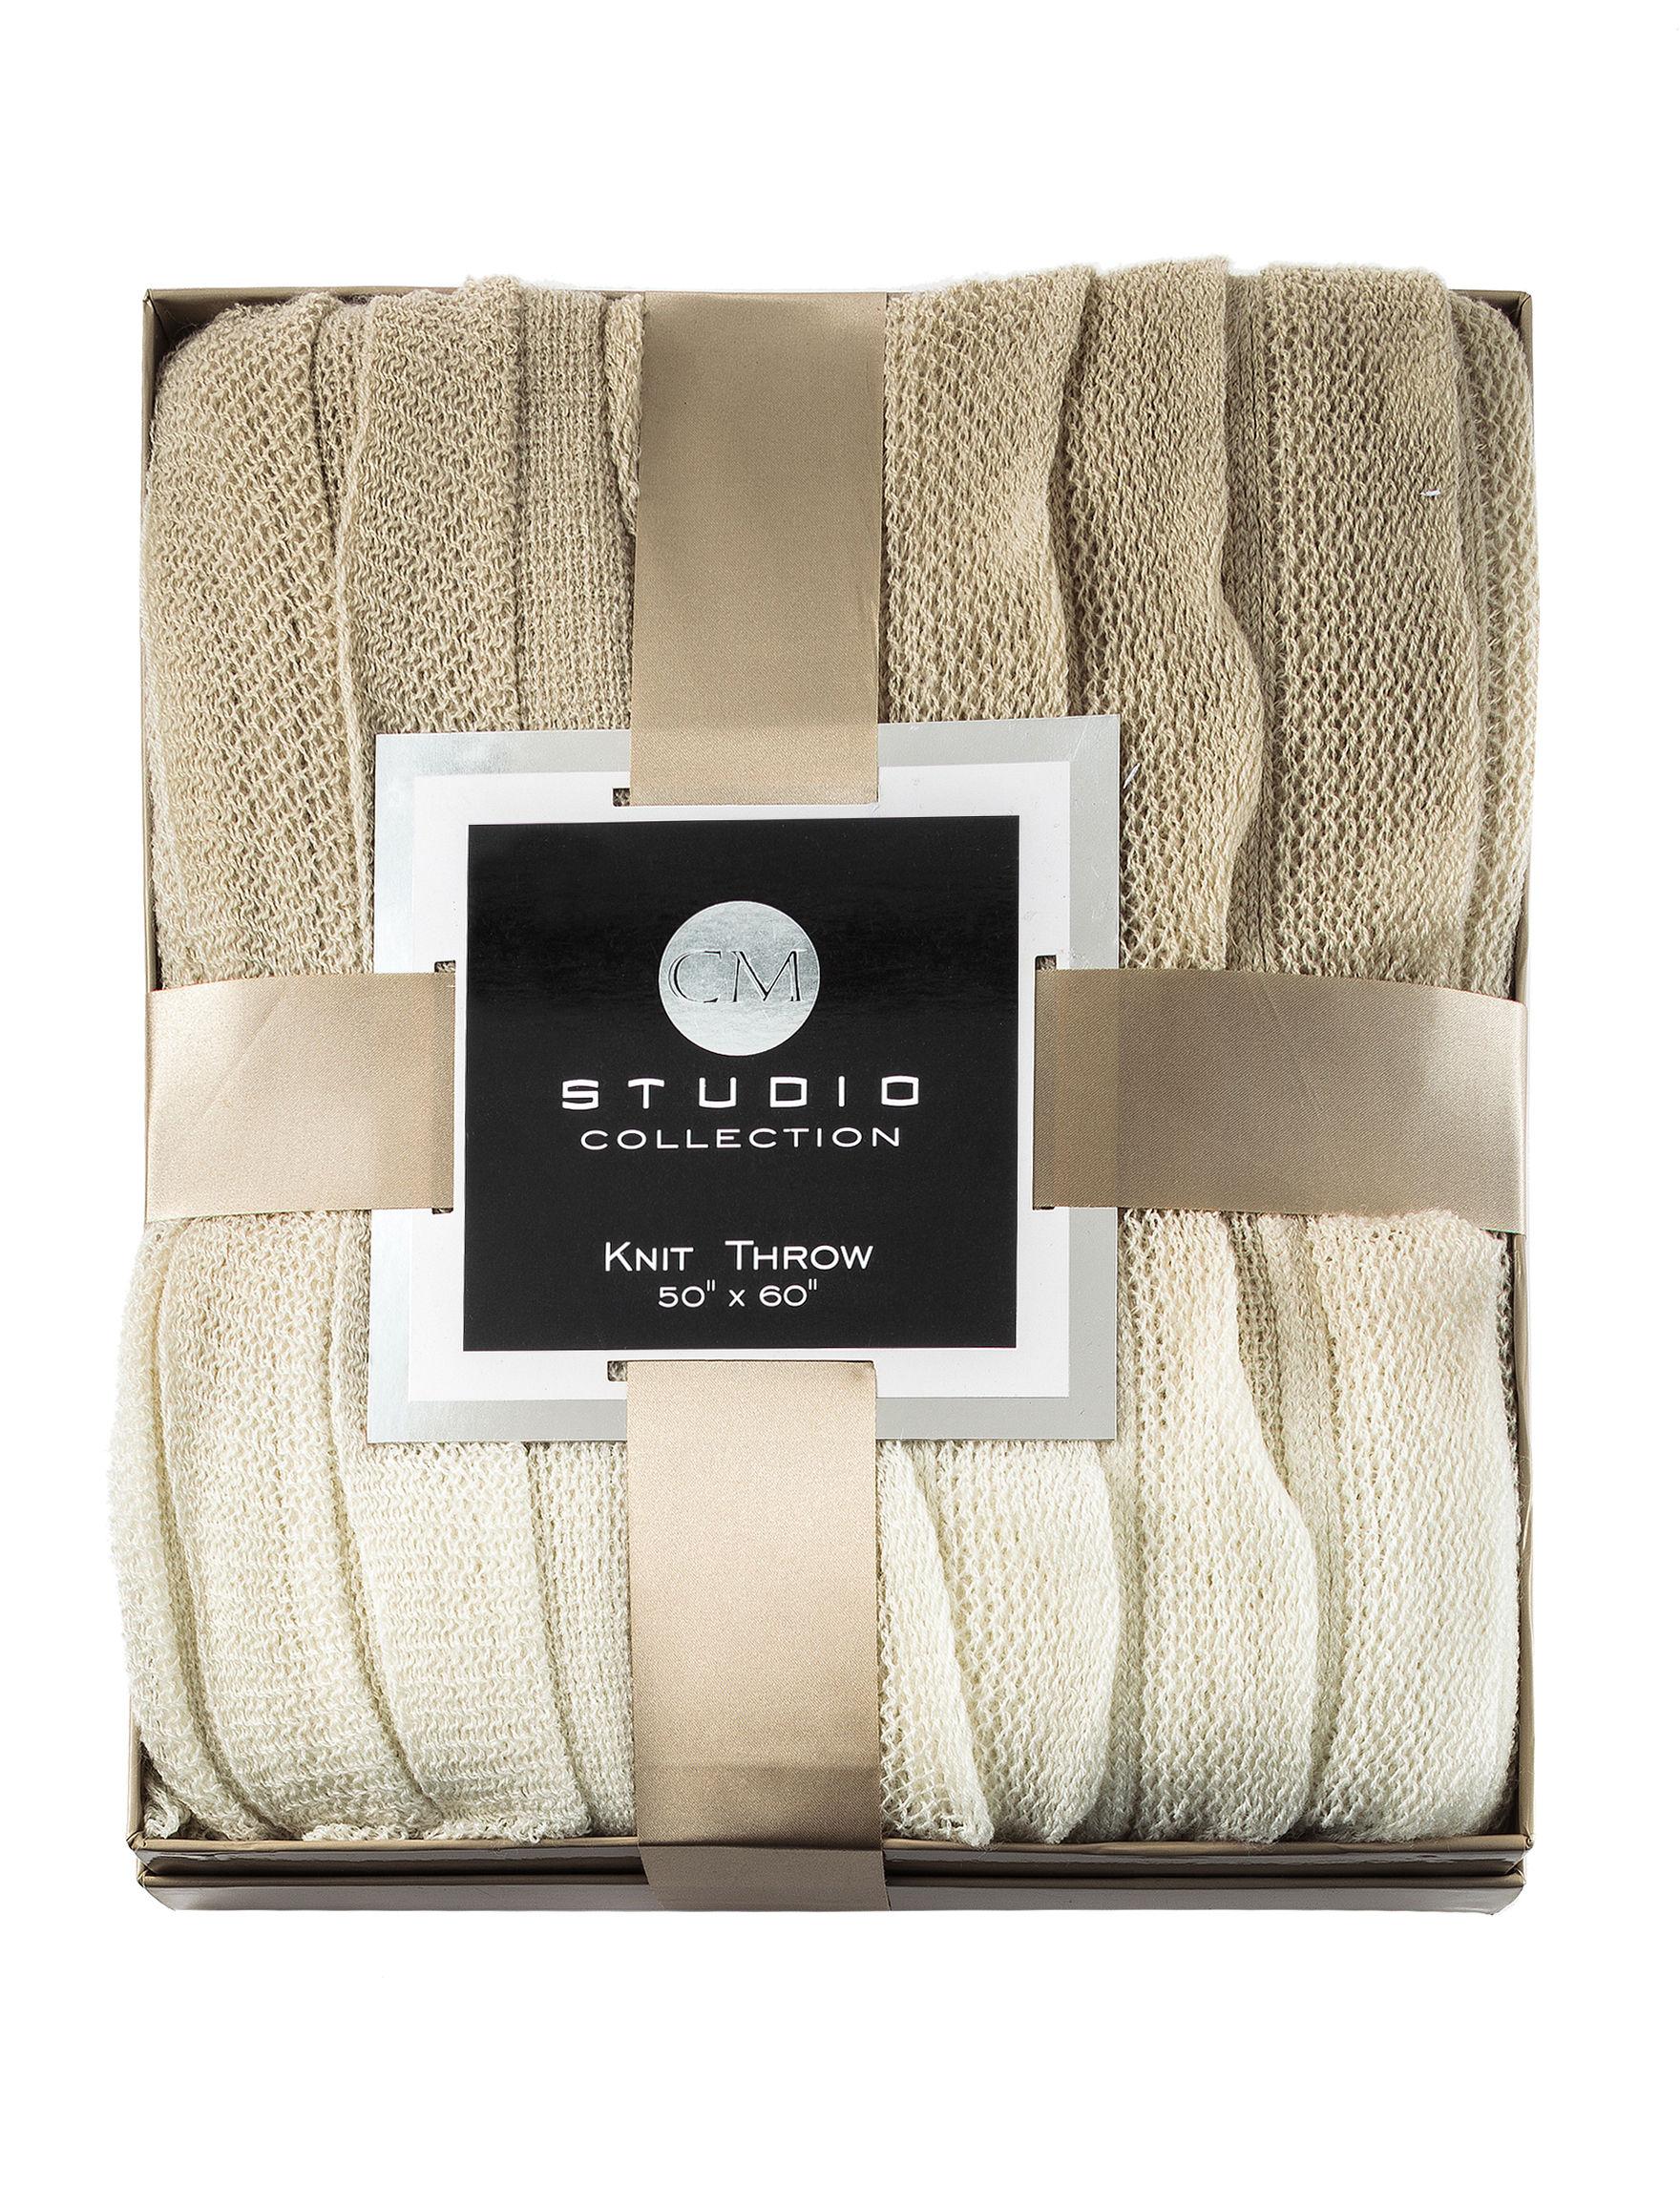 CM Studio Collection Mushroom Blankets & Throws